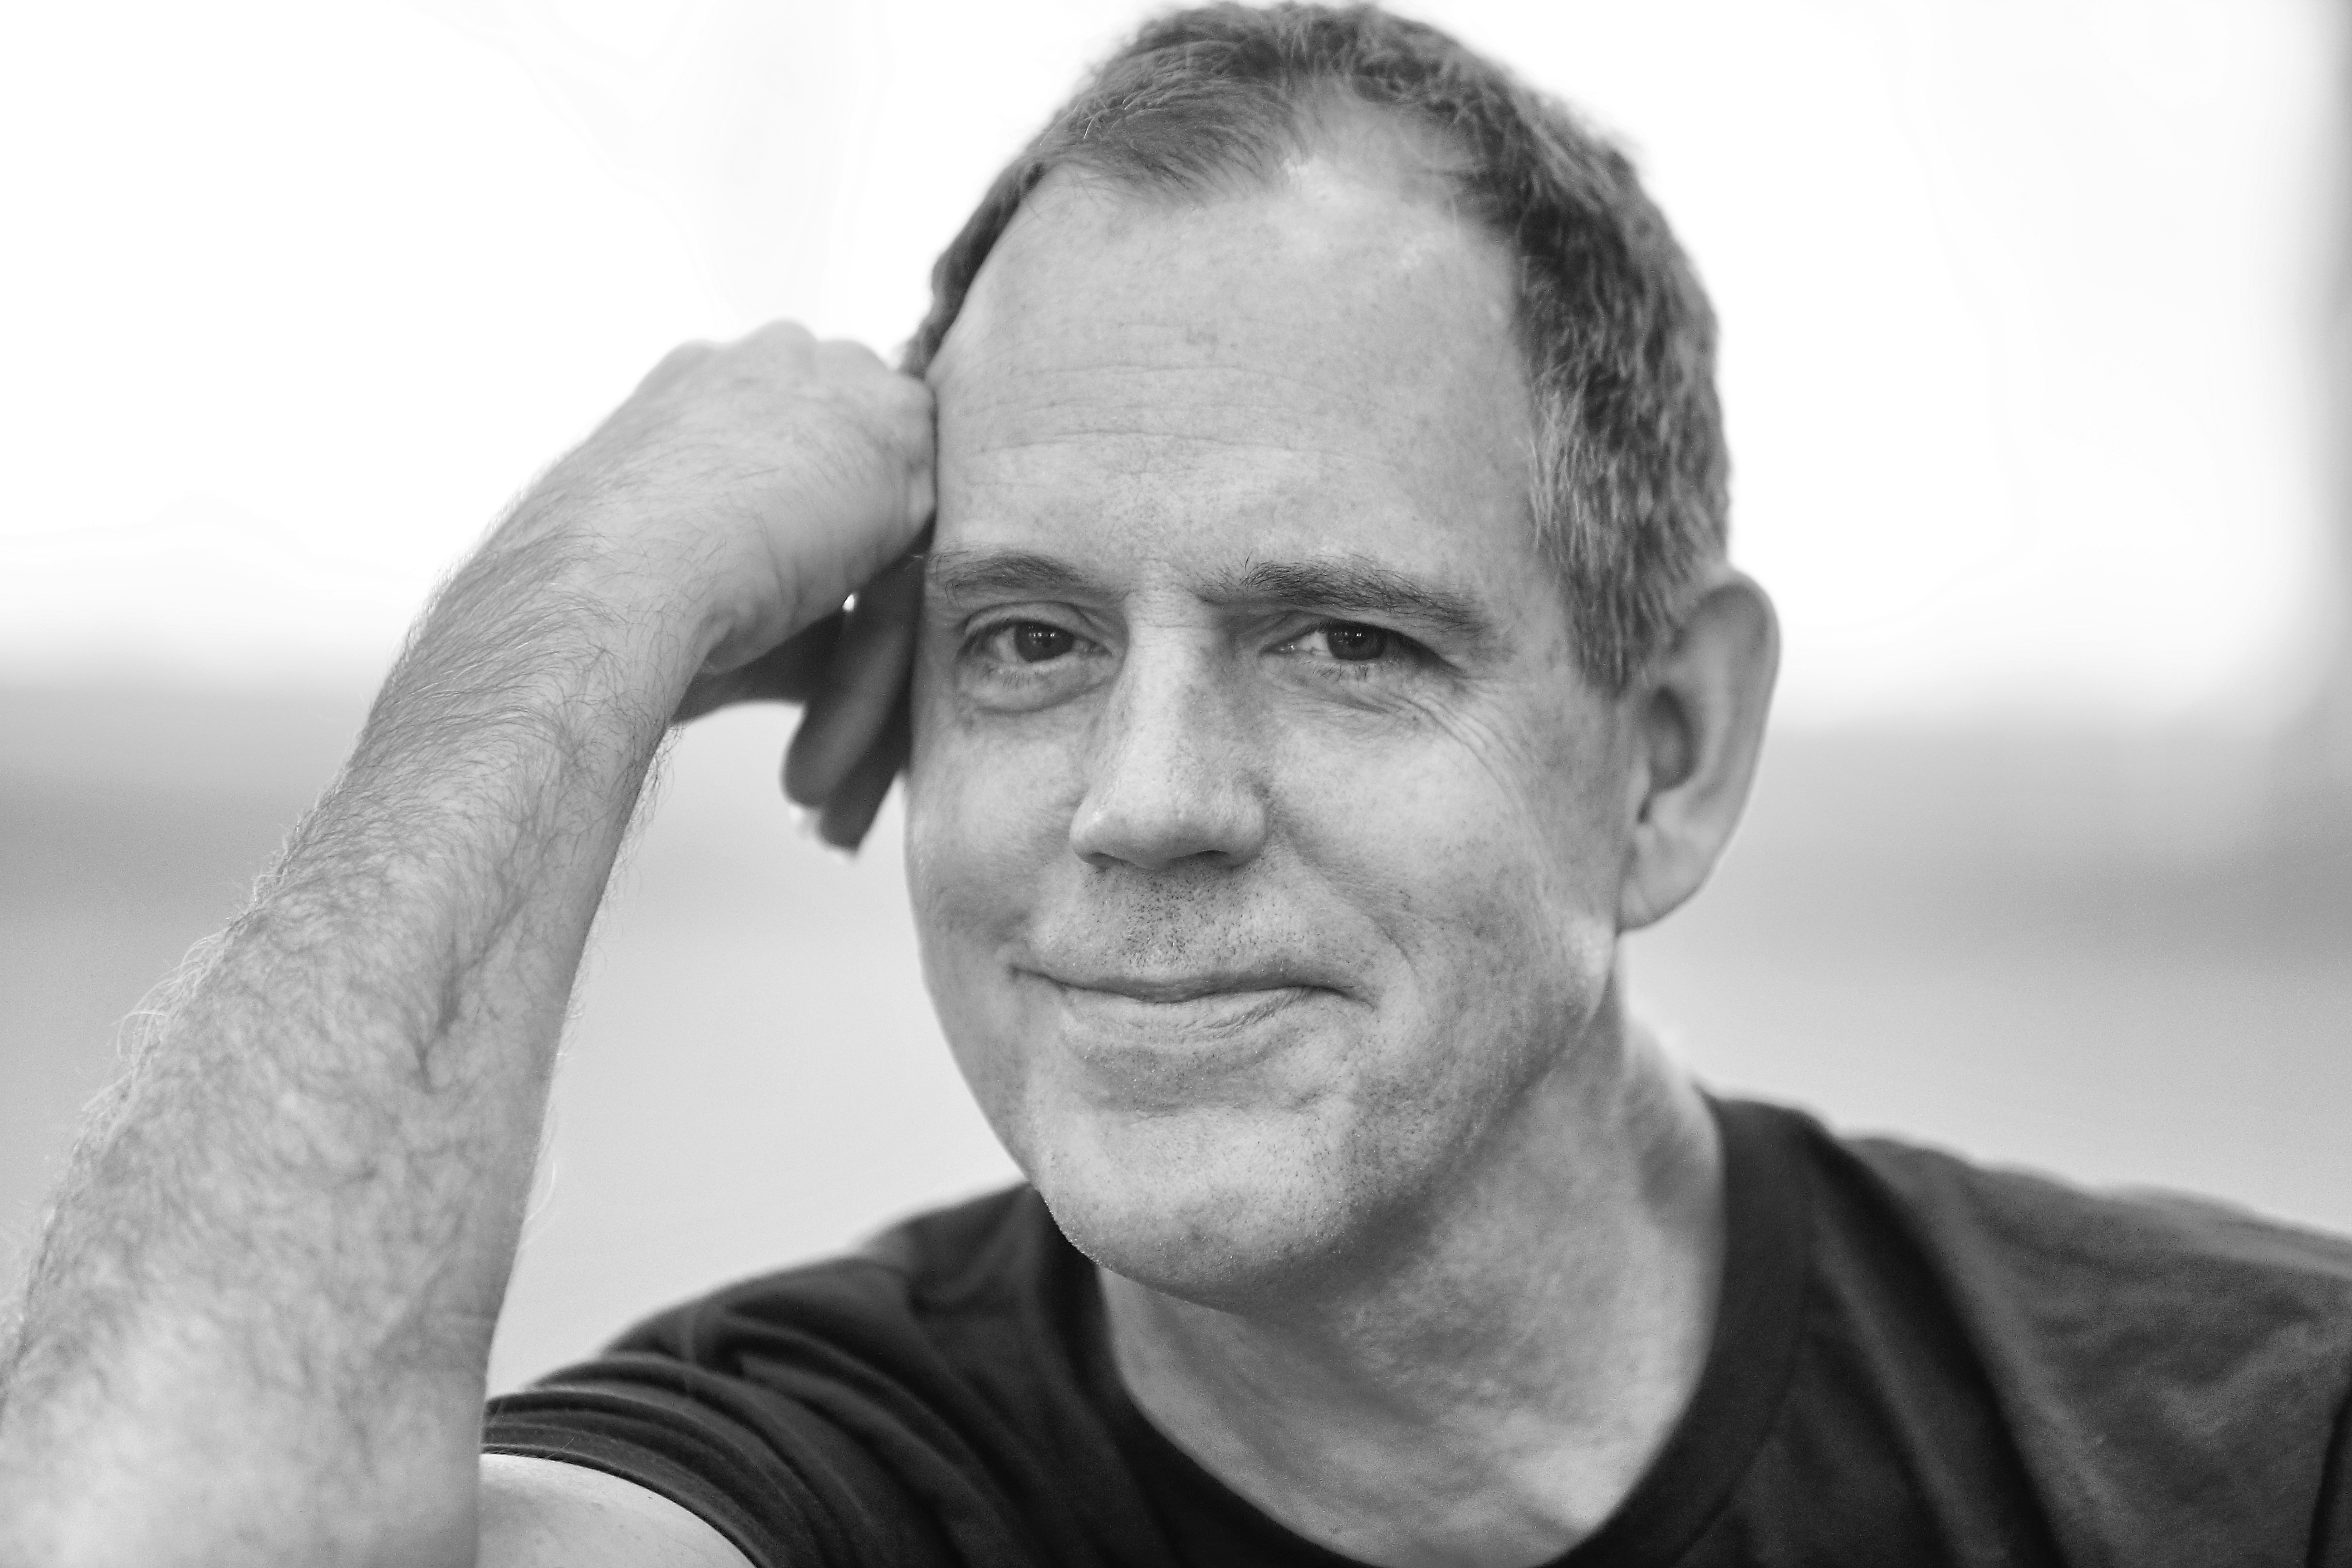 MIXTAPE: David Wilcox's Character Study